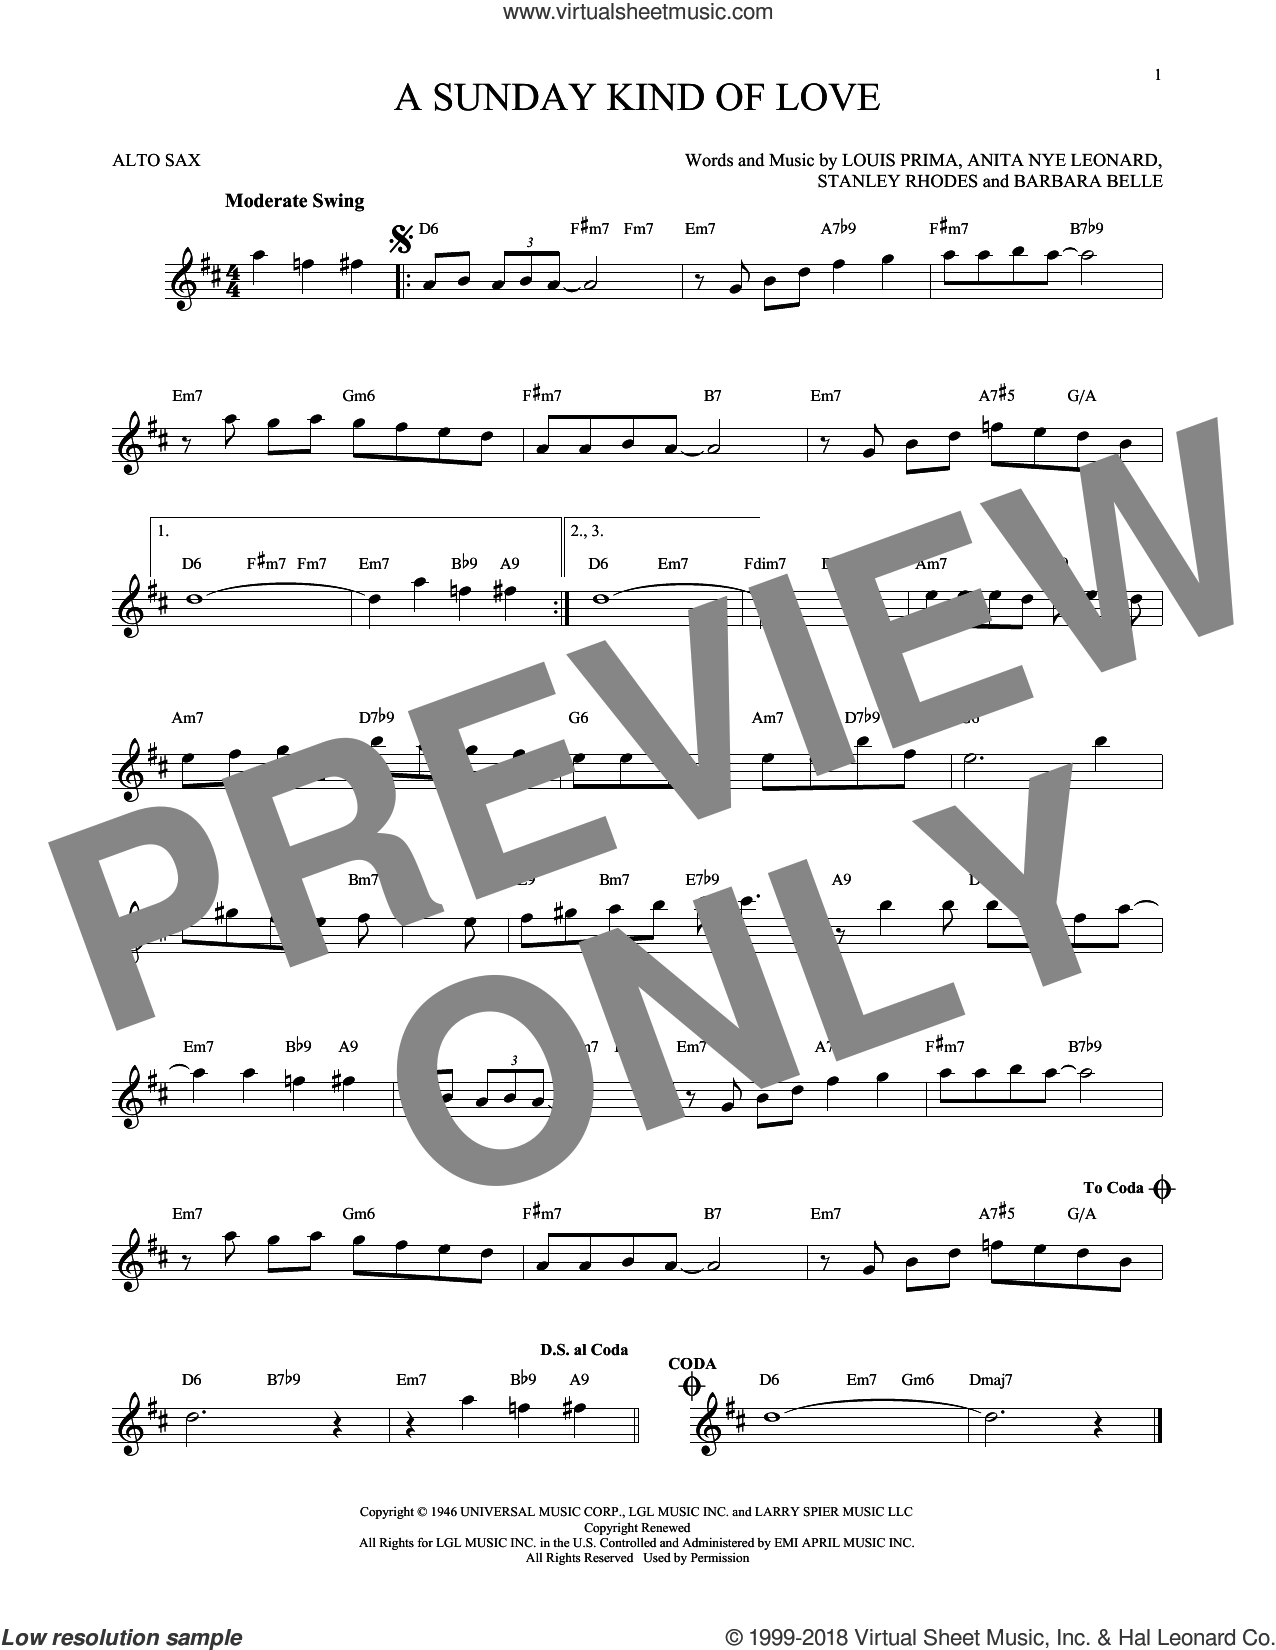 A Sunday Kind Of Love sheet music for alto saxophone solo by Etta James, Reba McEntire, Anita Nye Leonard, Barbara Belle, Louis Prima and Stanley Rhodes, intermediate skill level